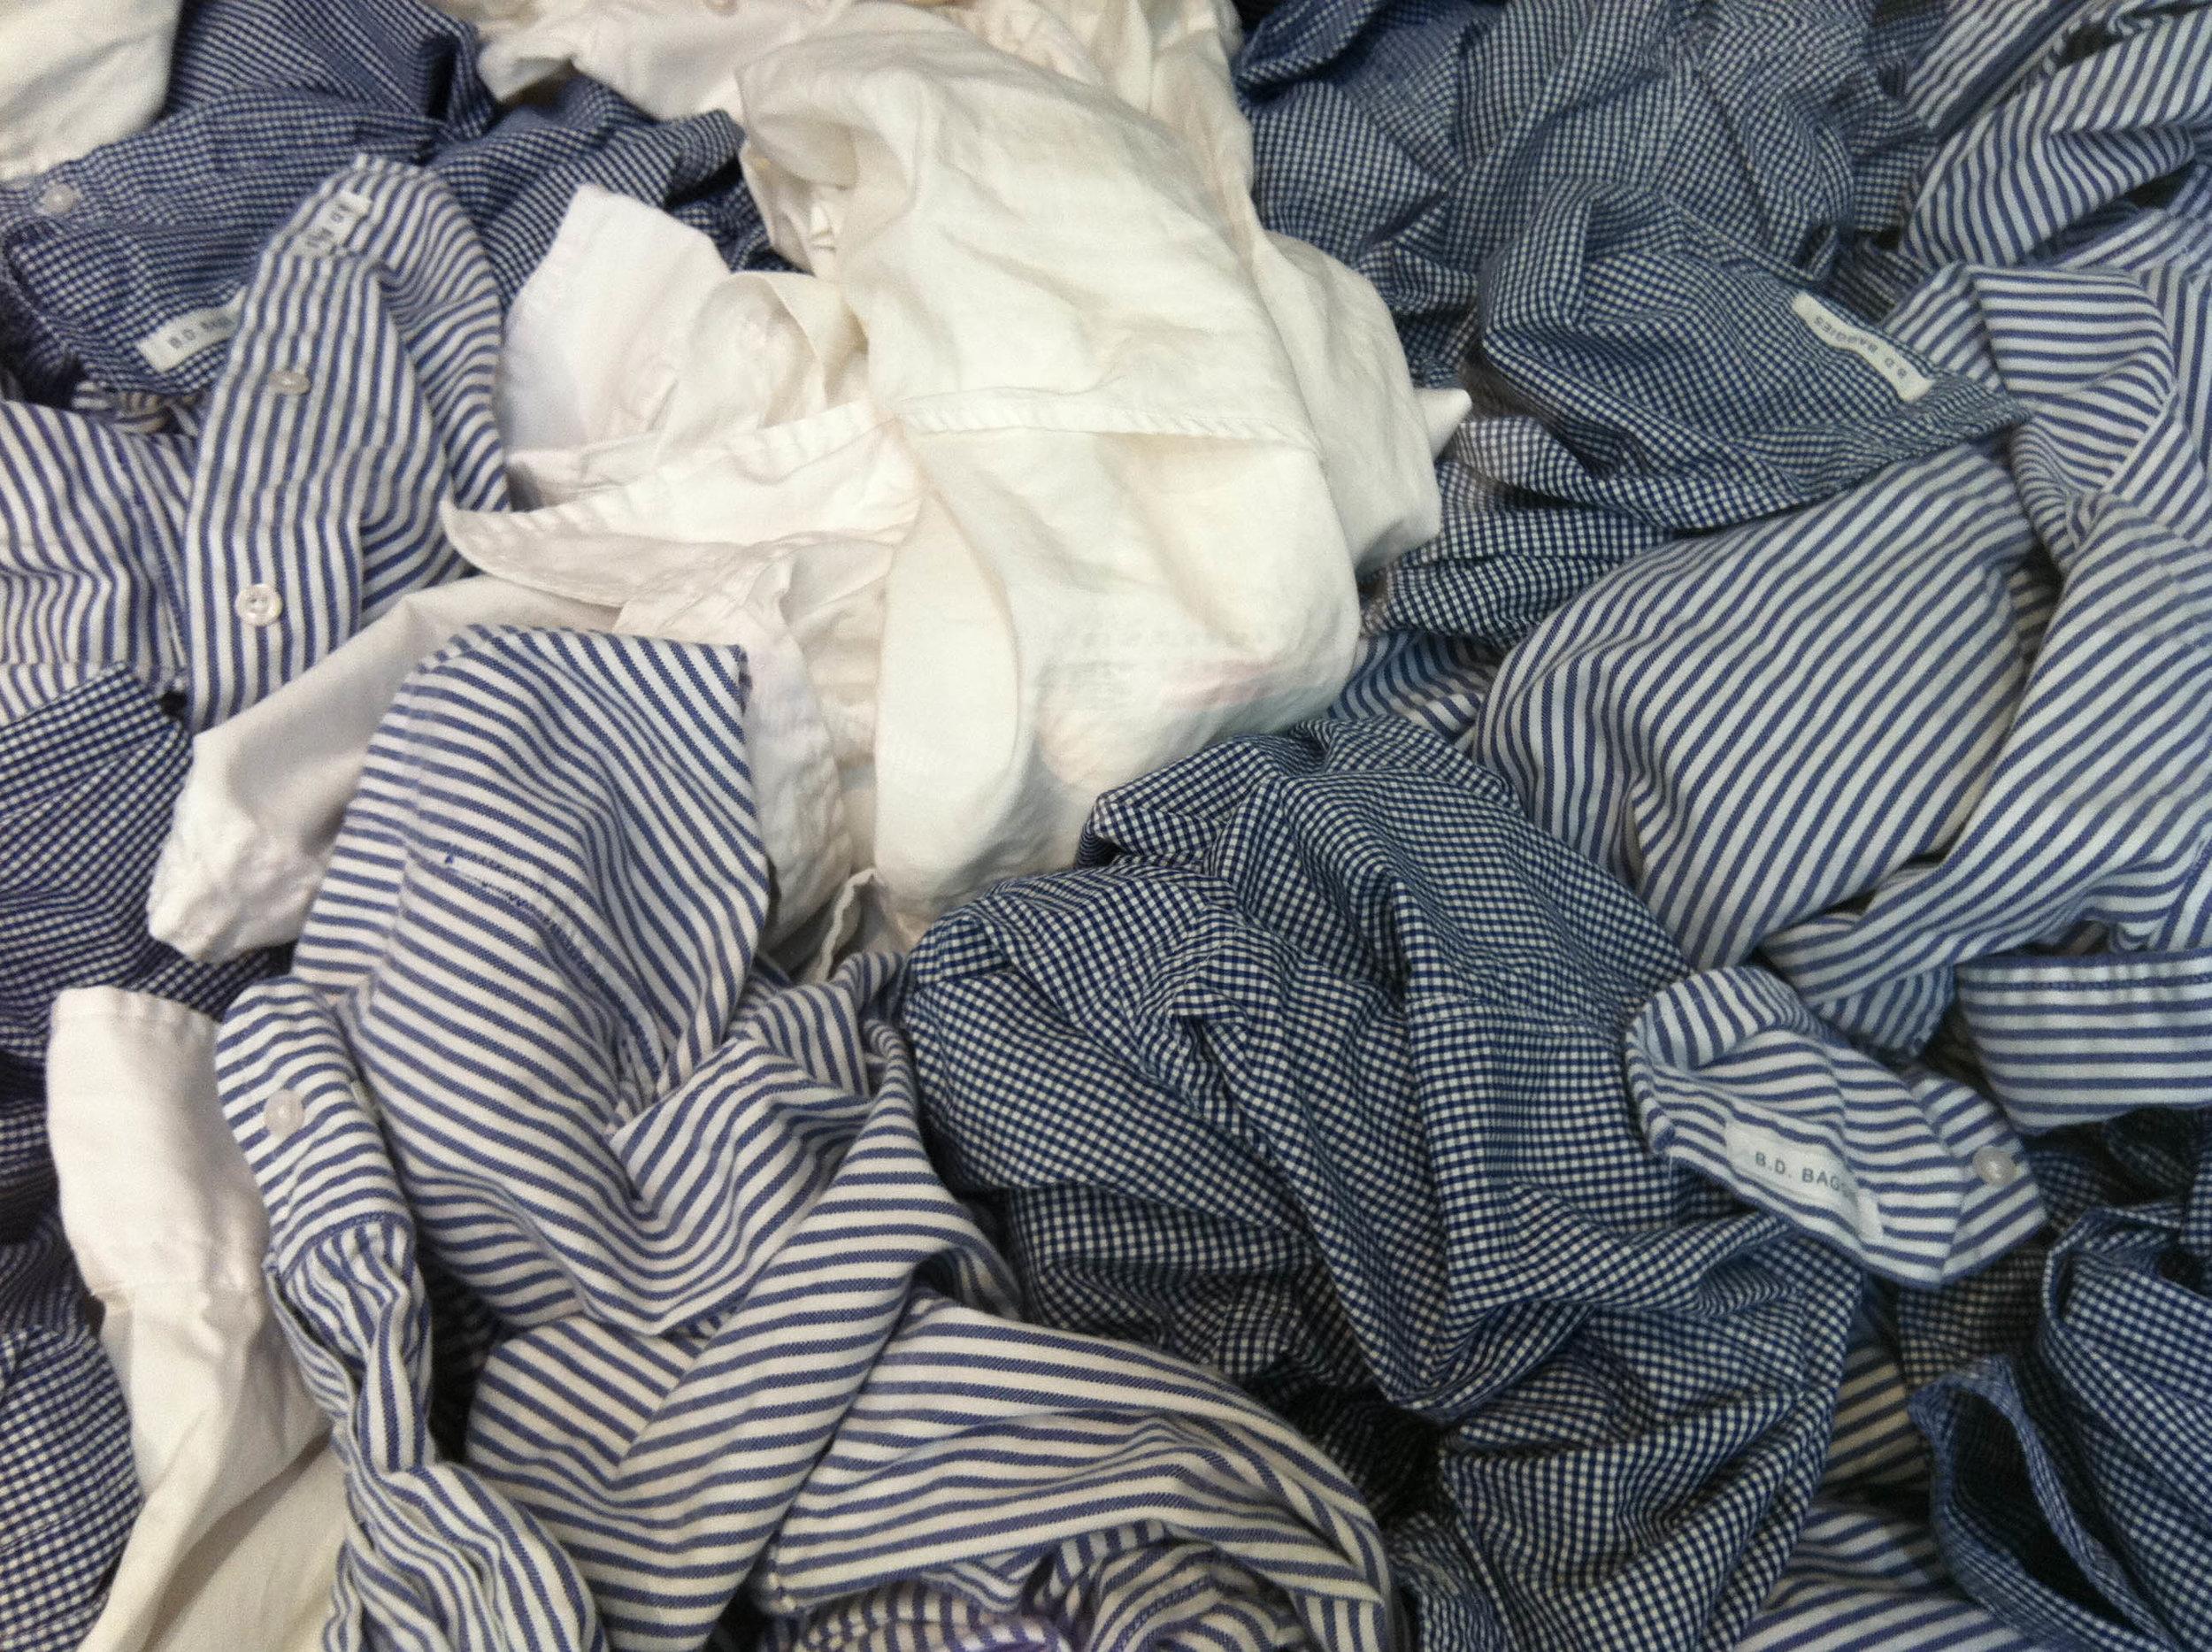 balled shirts.jpg